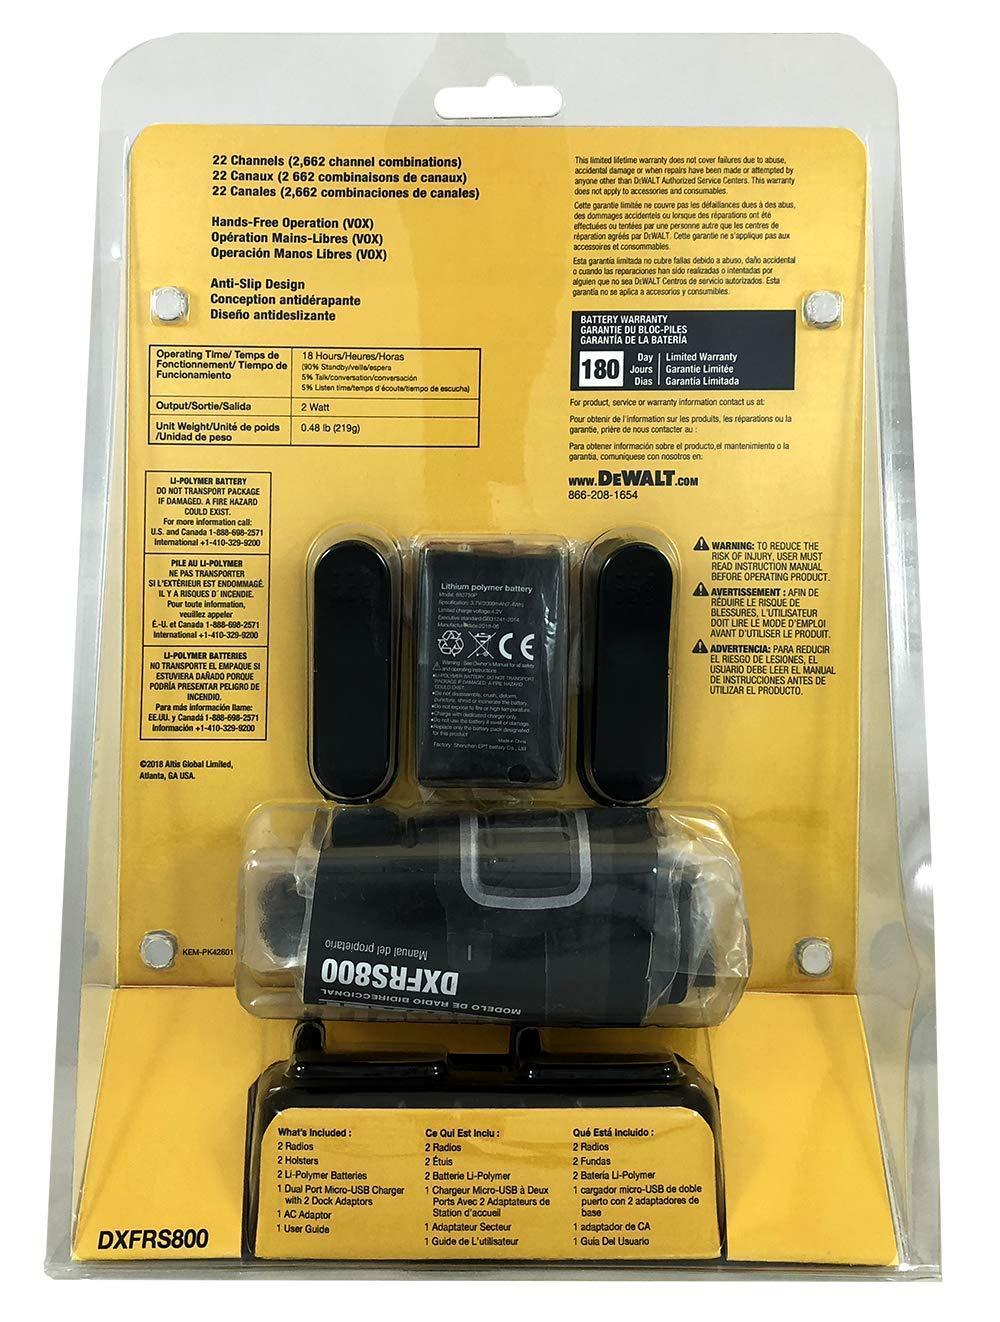 DeWALT DXFRS800 2W Walkie Talkies Heavy Duty Business Two-Way Radios (Pair) by DEWALT (Image #13)